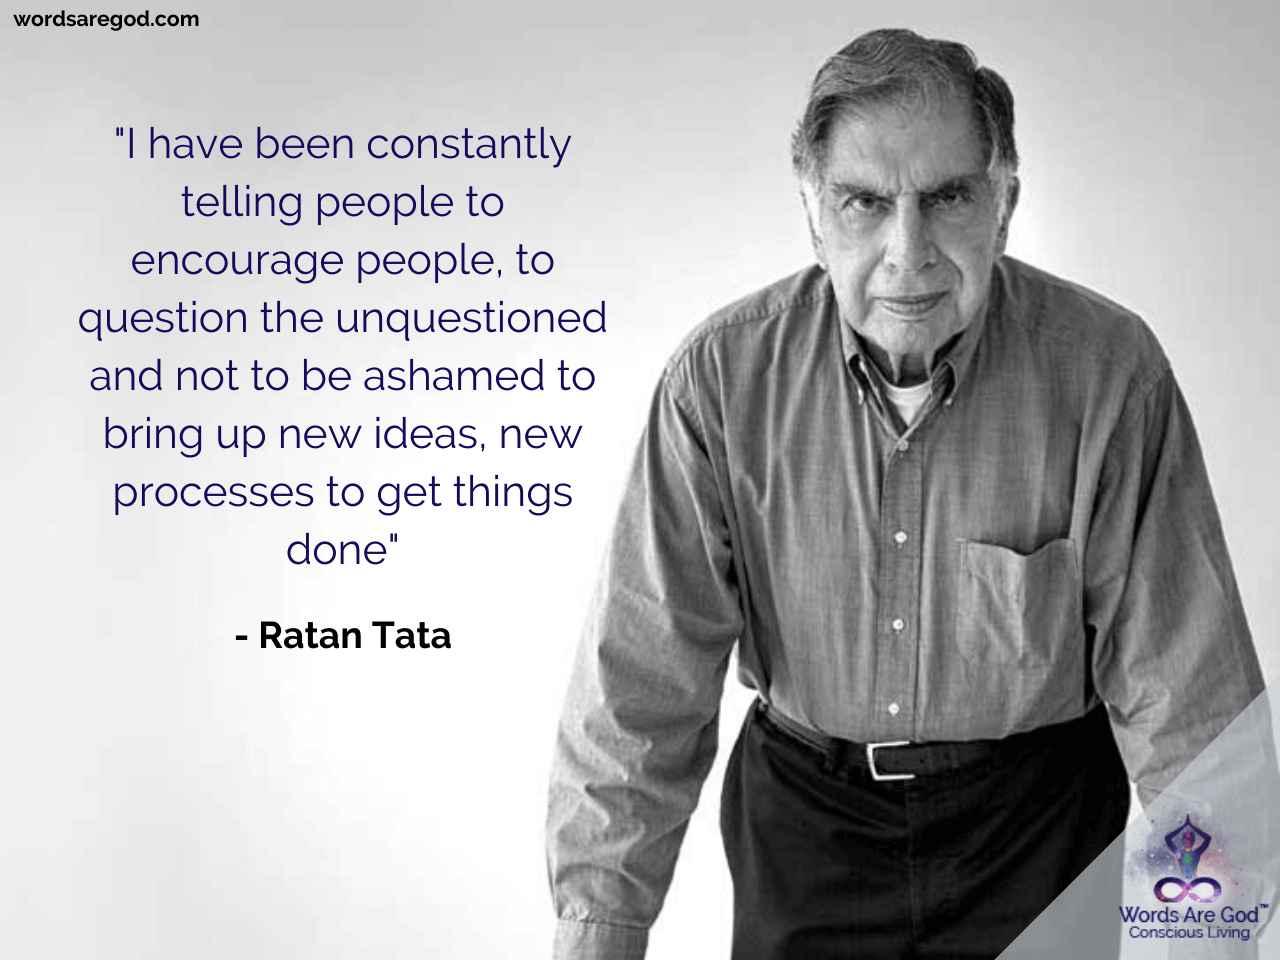 Ratan Tata Life Quote by Ratan Tata